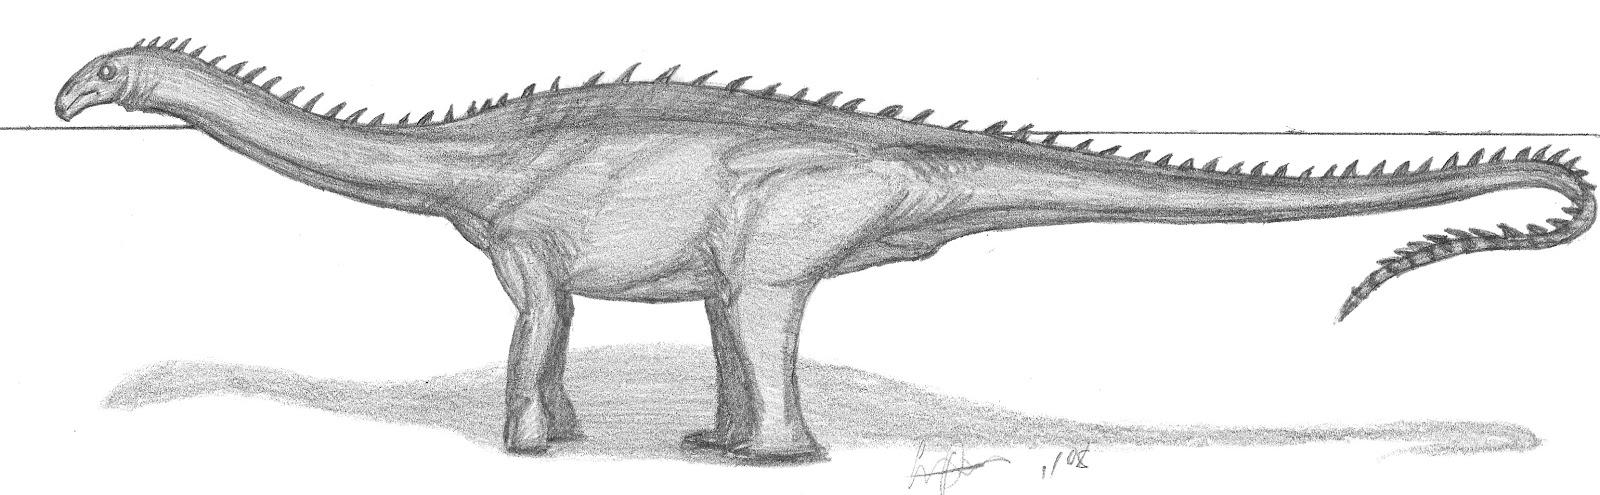 1600 x 495 jpeg 160kBChasmatosaurus